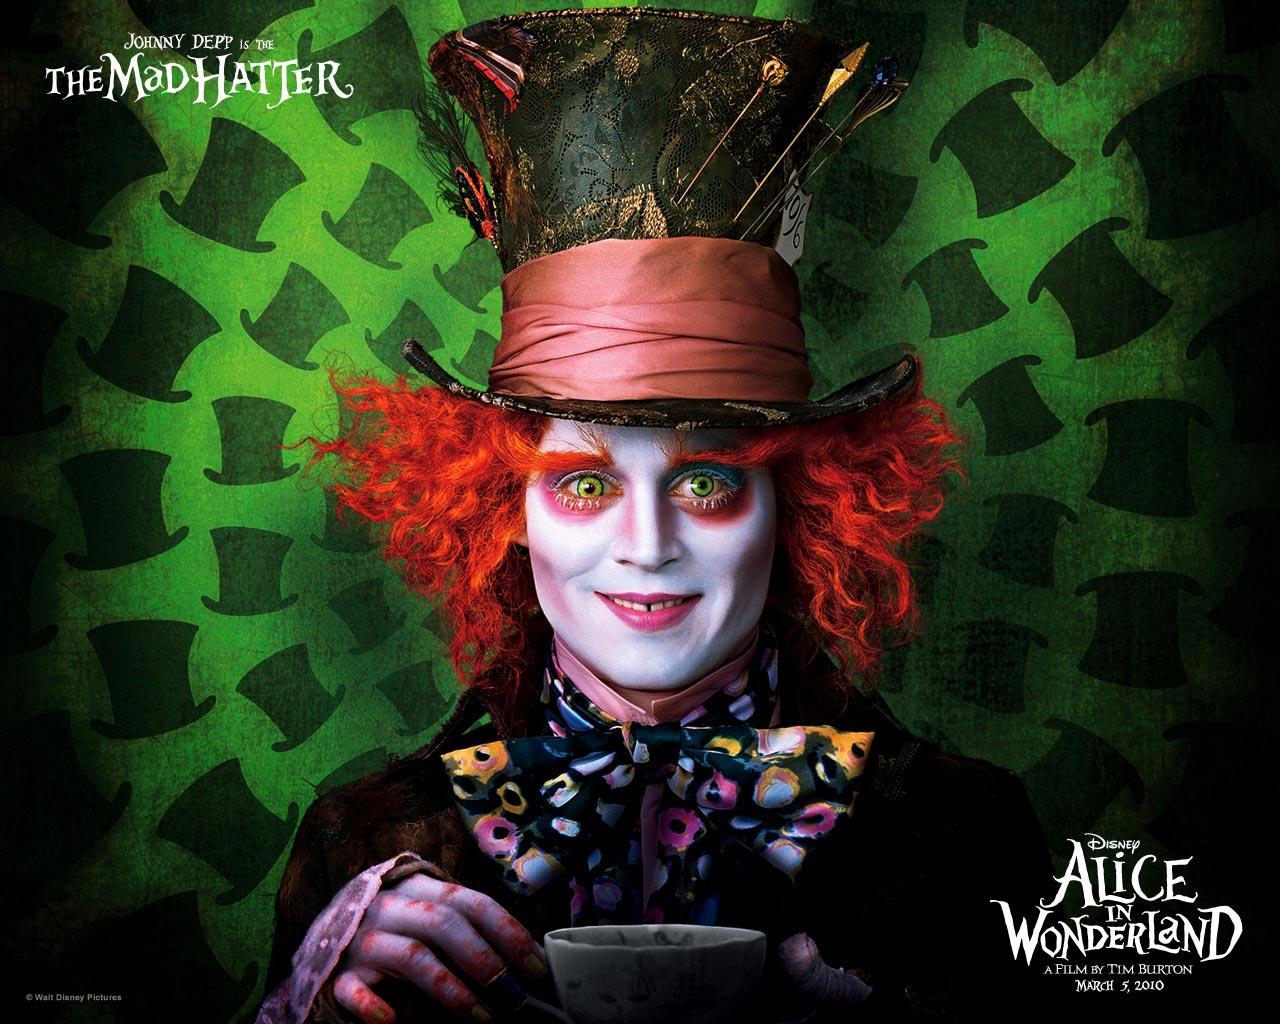 Johnny Depp as Mad Hatter, Alice in Wonderland Wallpaper